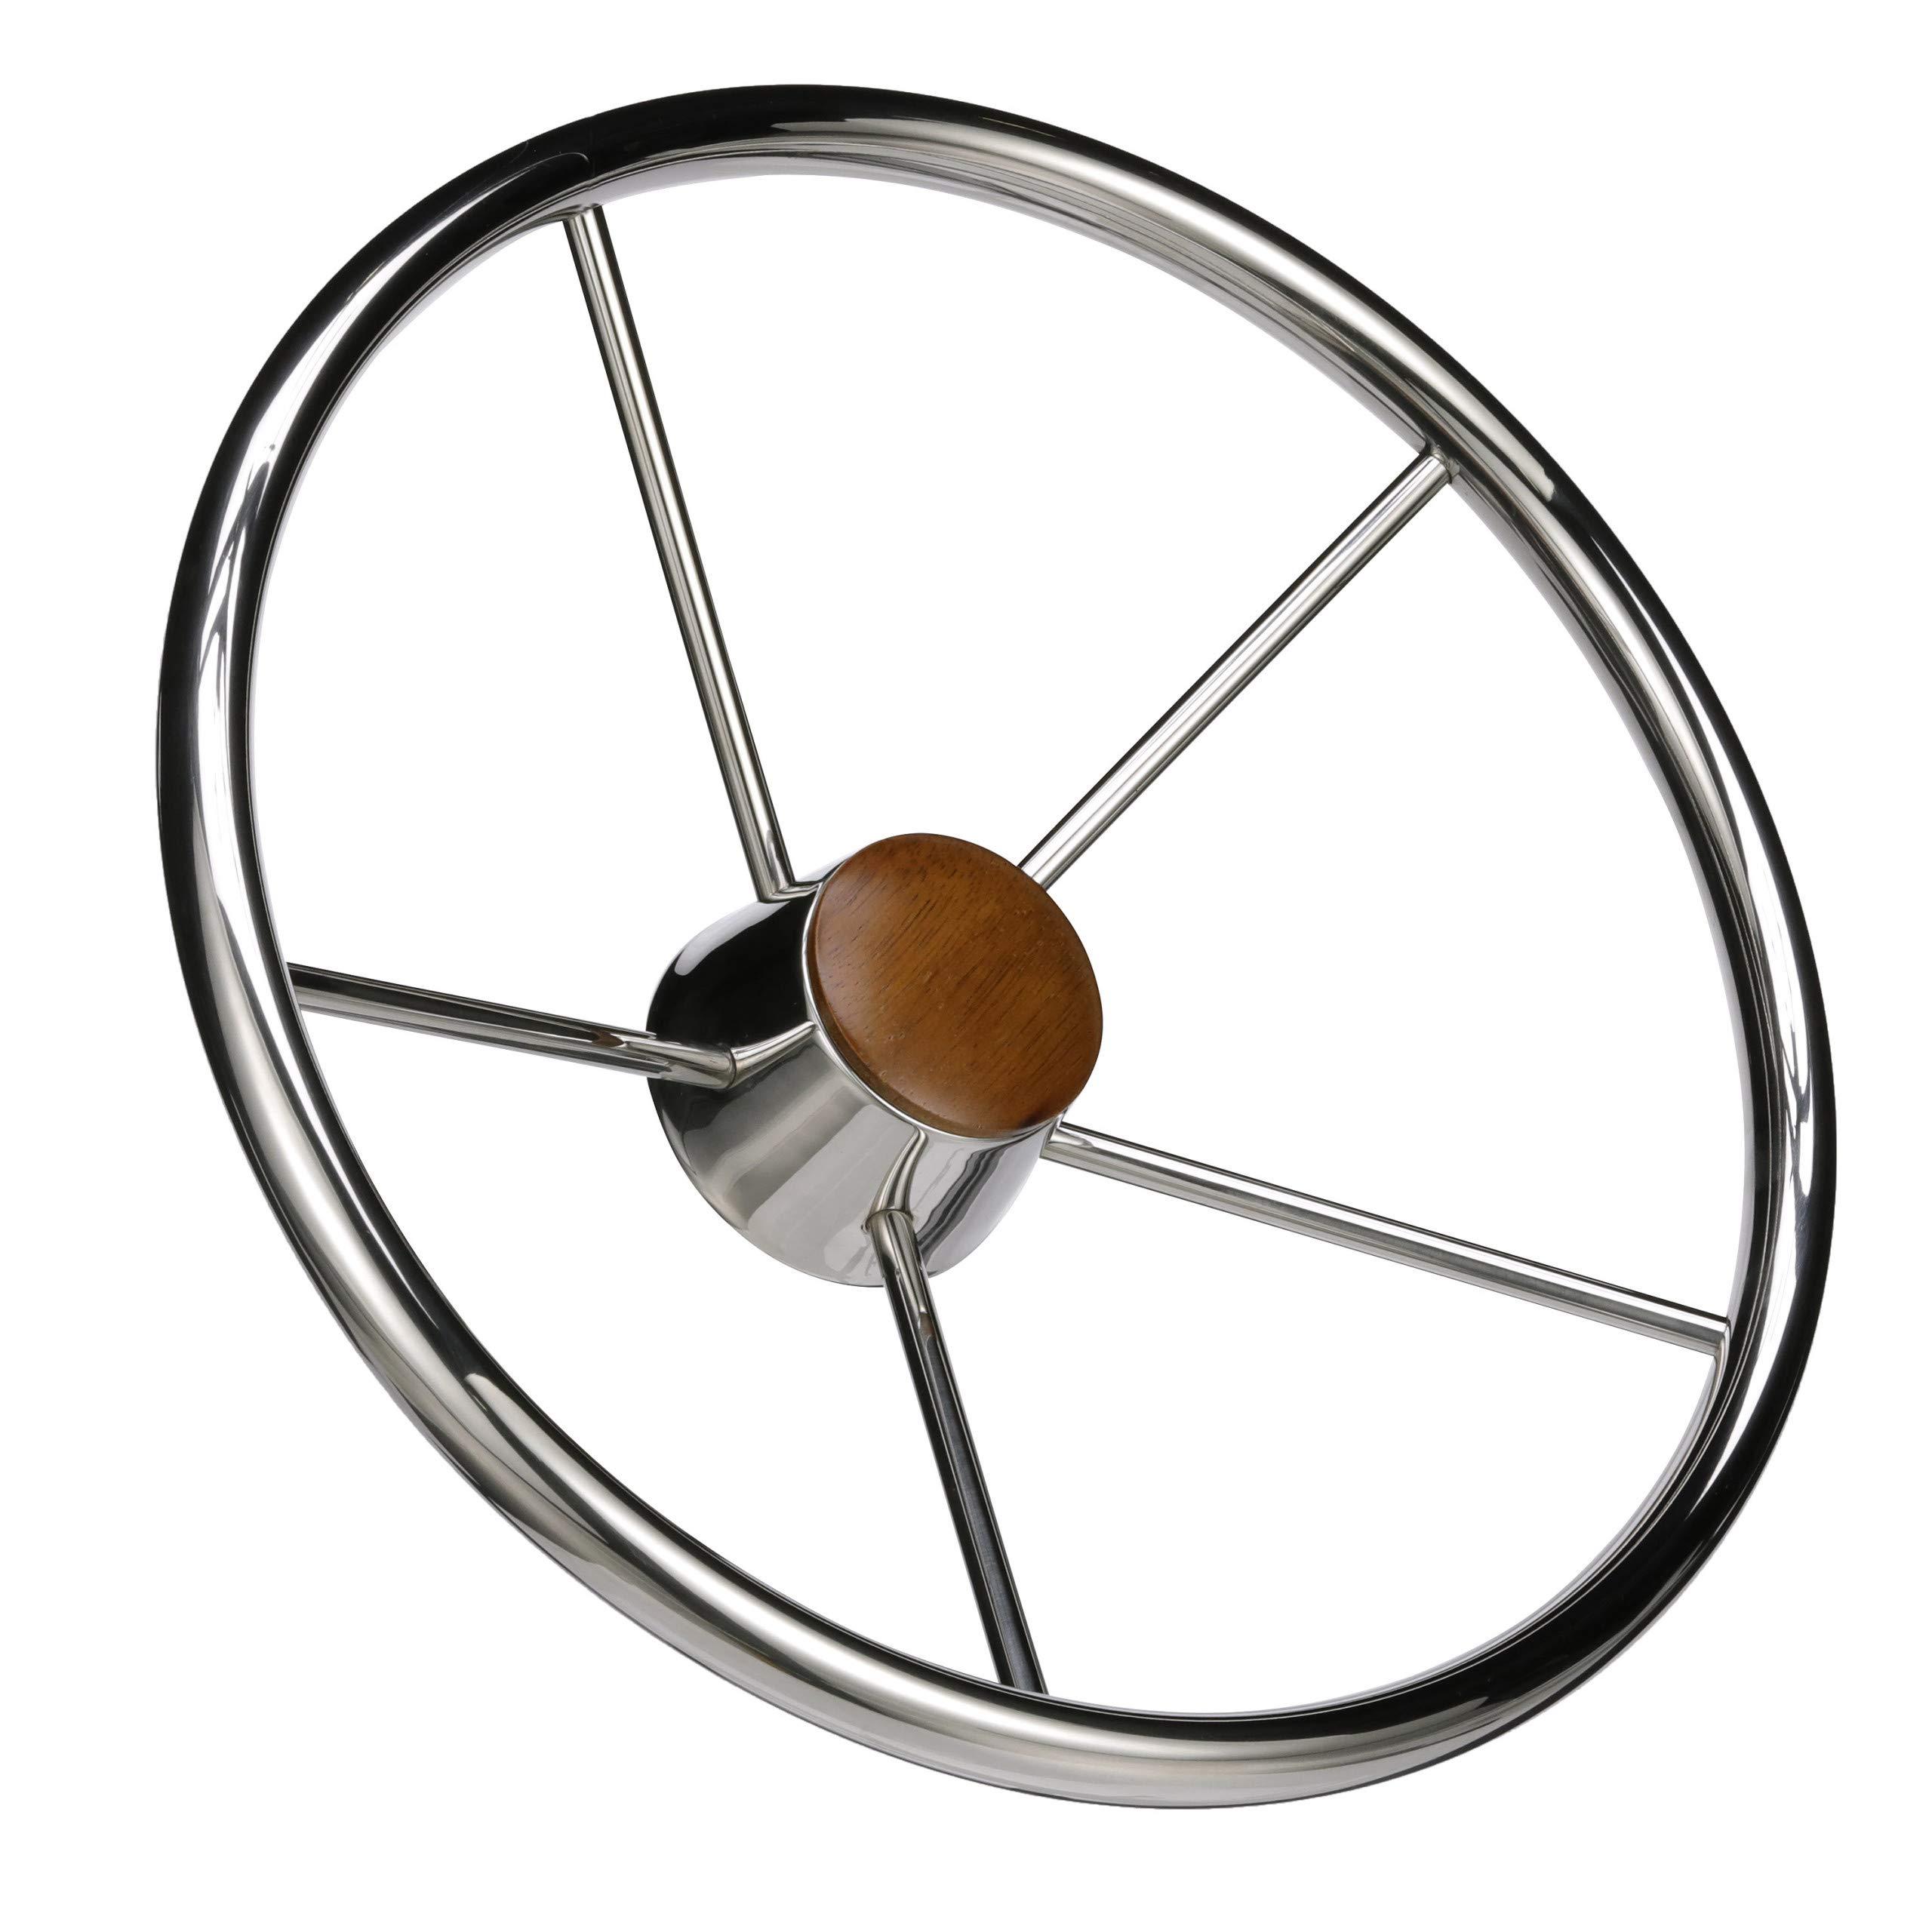 Seachoice 28551 5-Spoke Destroyer Steering Wheel - Stainless Steel - Genuine Teak Center Cap, Chrome, 15-inch Diameter by SEACHOICE